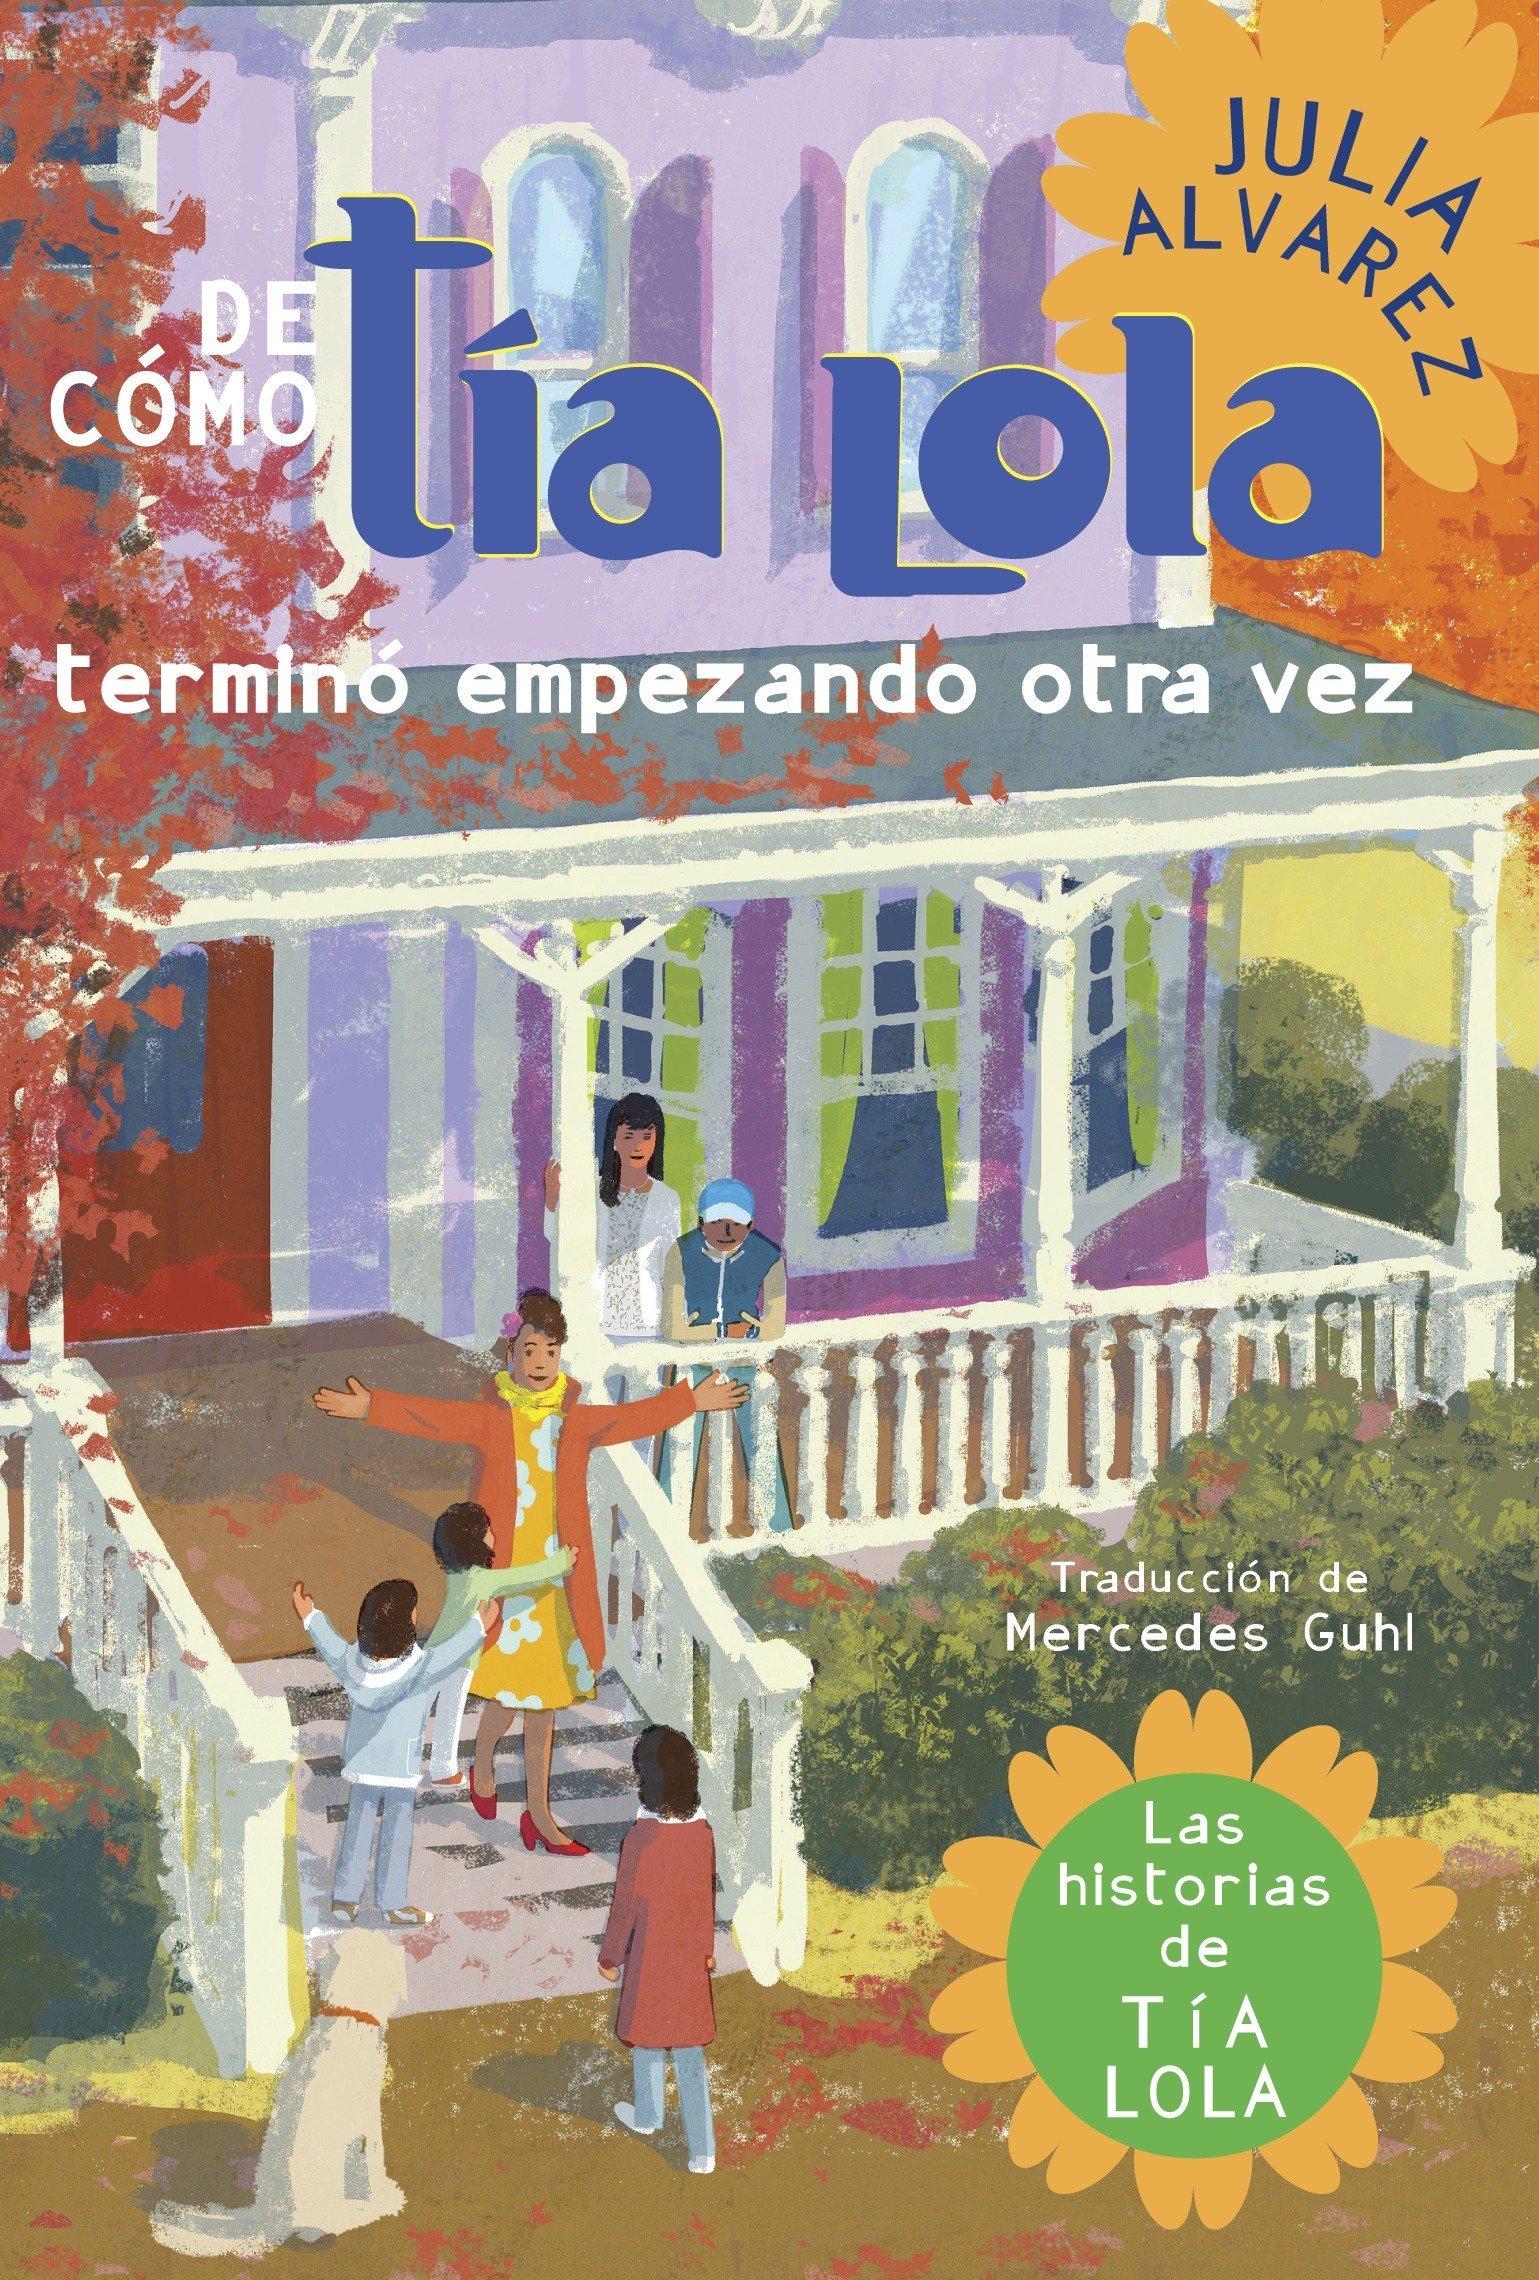 Download De como tia Lola termino empezando otra vez (The Tia Lola Stories) (Spanish Edition) pdf